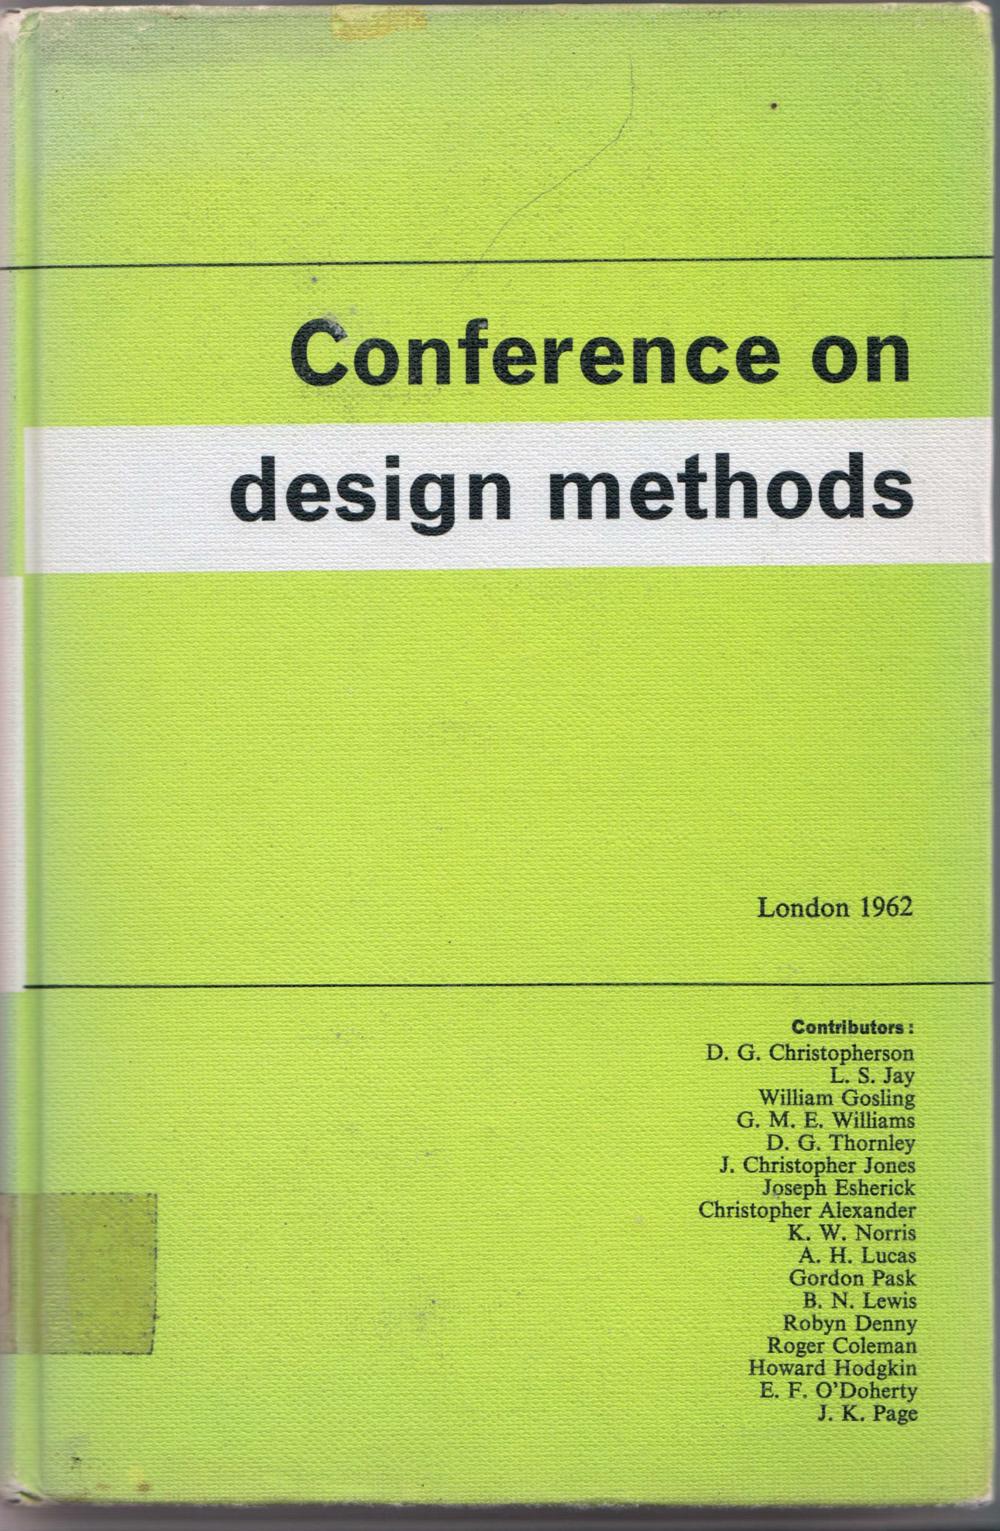 1962 Conference on Design Methods